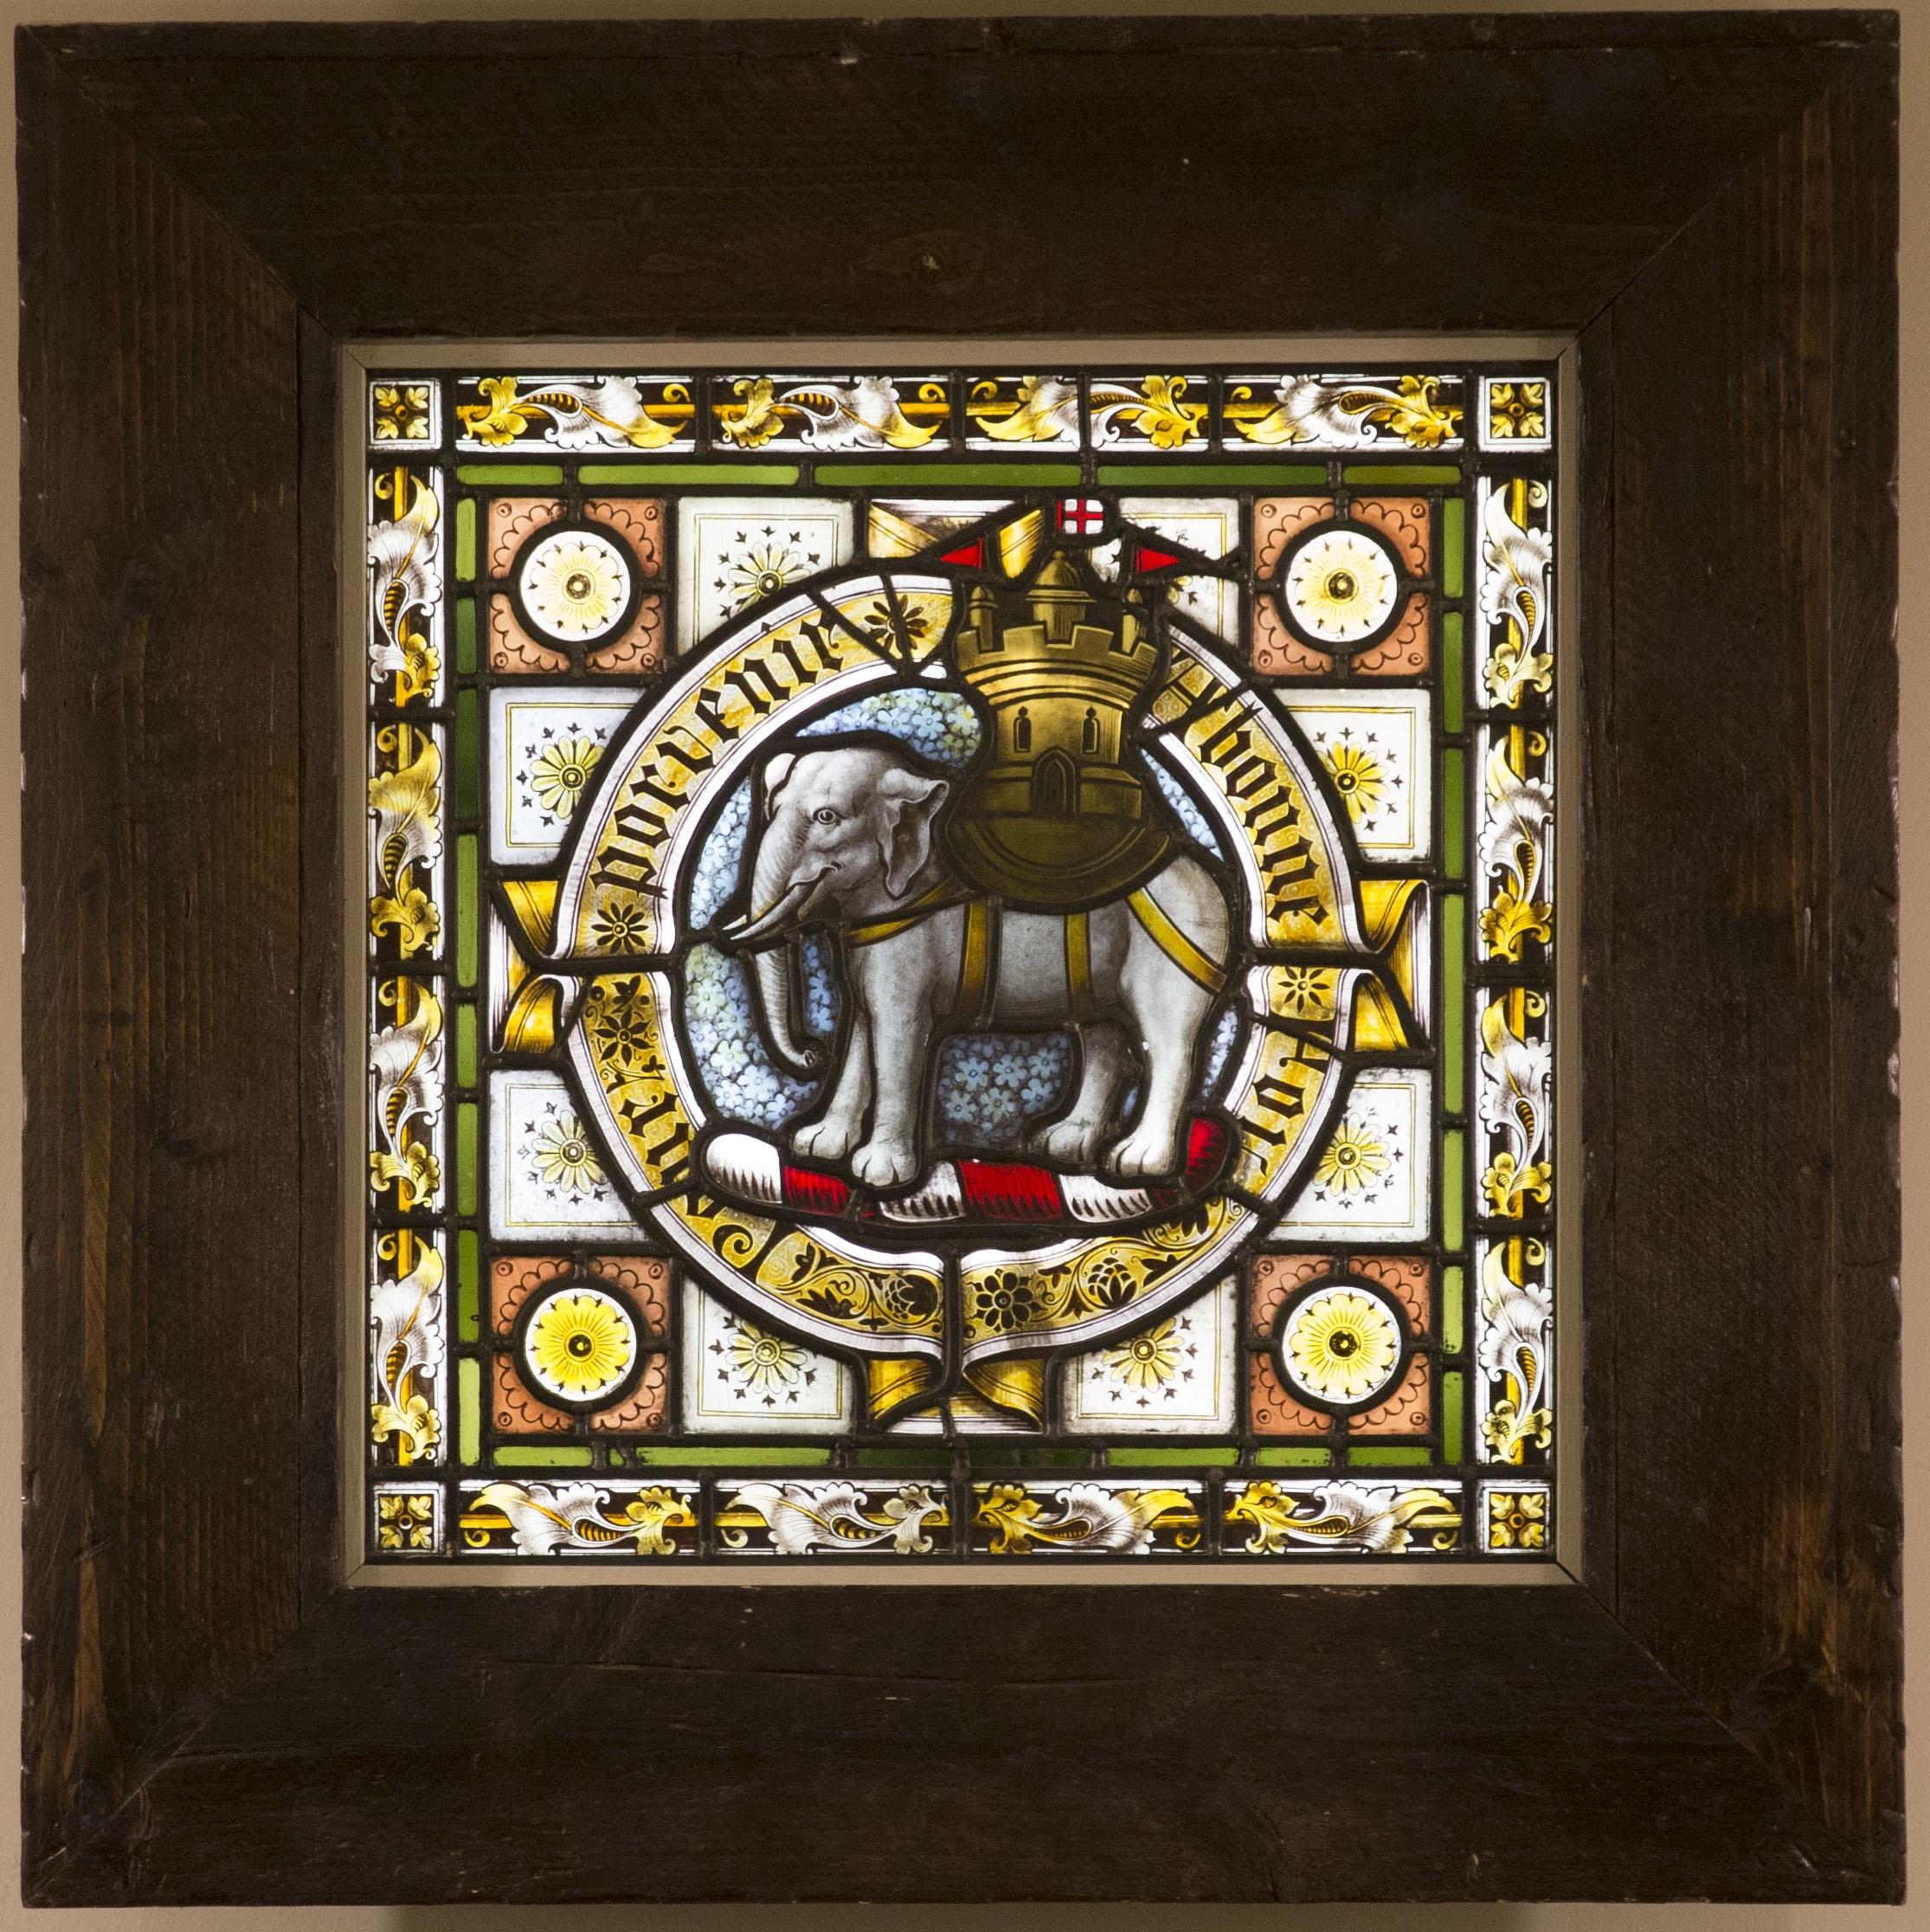 Fotos gratis : ventana, vaso, catedral, material, elefante, Vitral ...